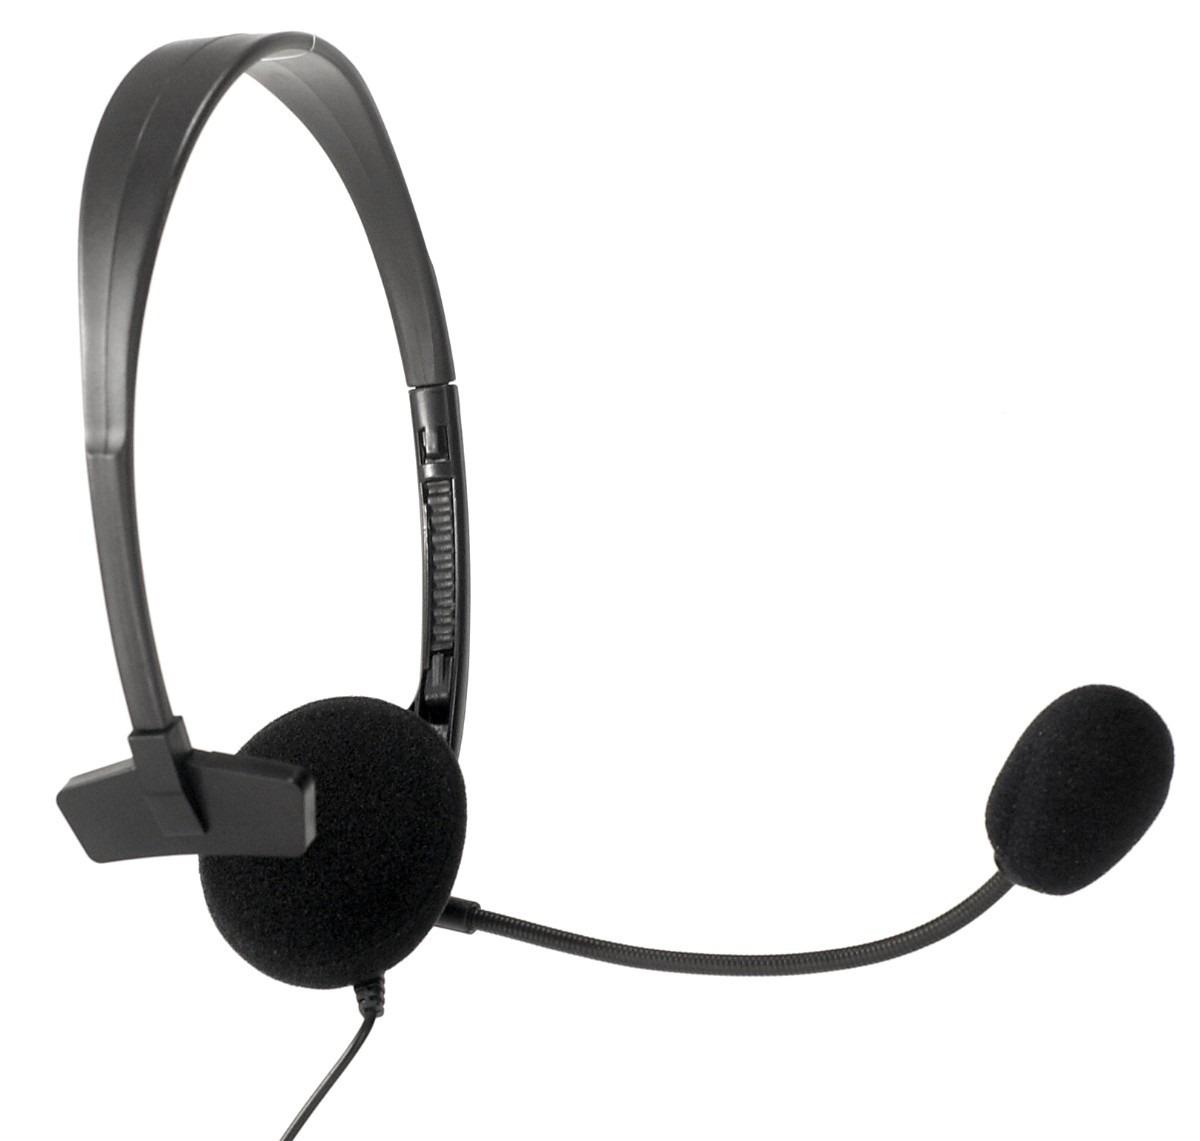 Fone De Ouvido Playstation 4 Ps4 Microfone Jogue Online